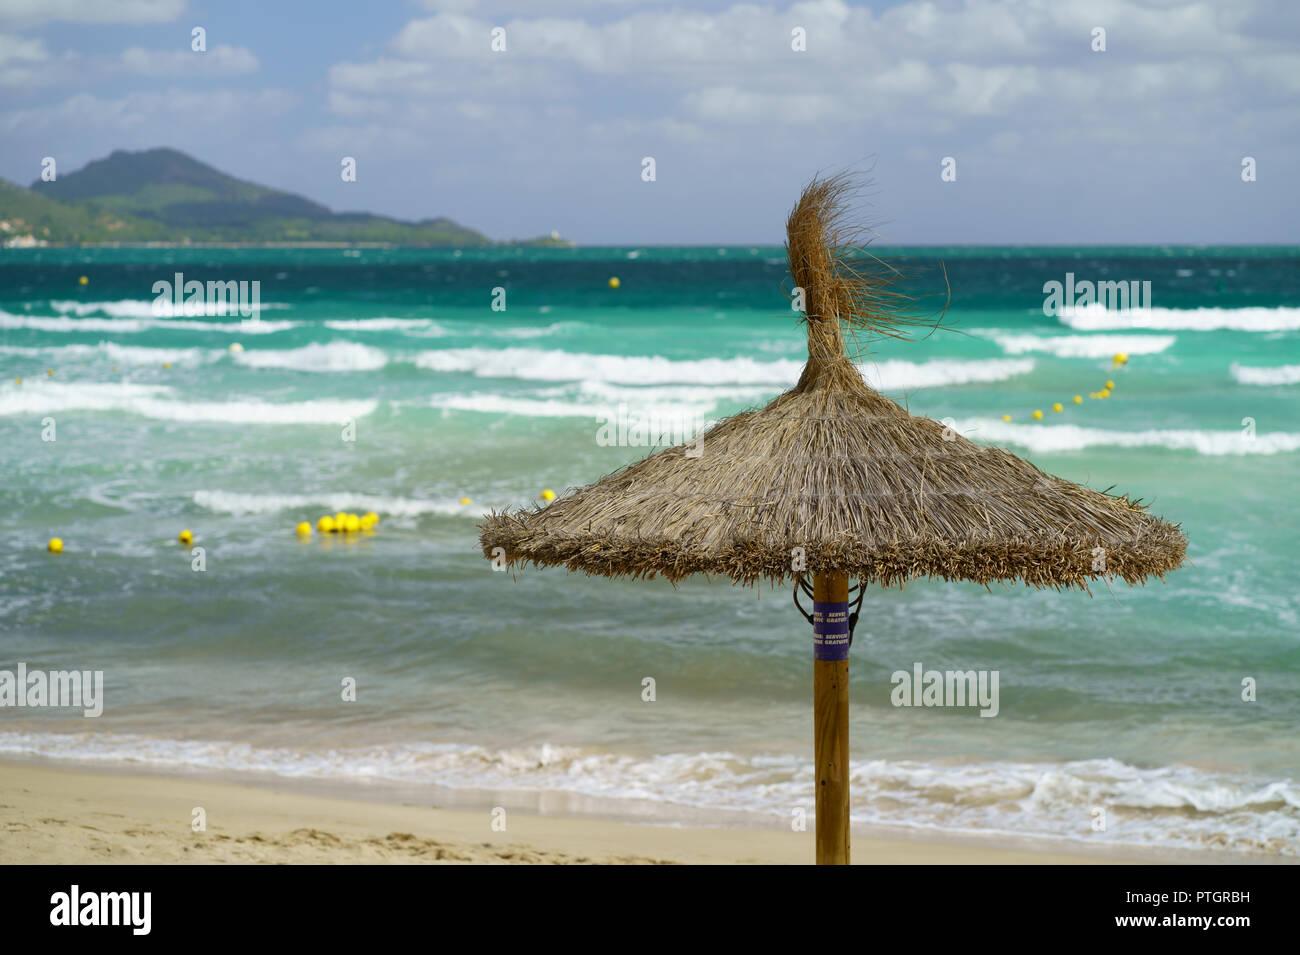 Straw Umbrella on the Beach, Playa de Muro, Alcudia, Mallorca, Spain - Stock Image